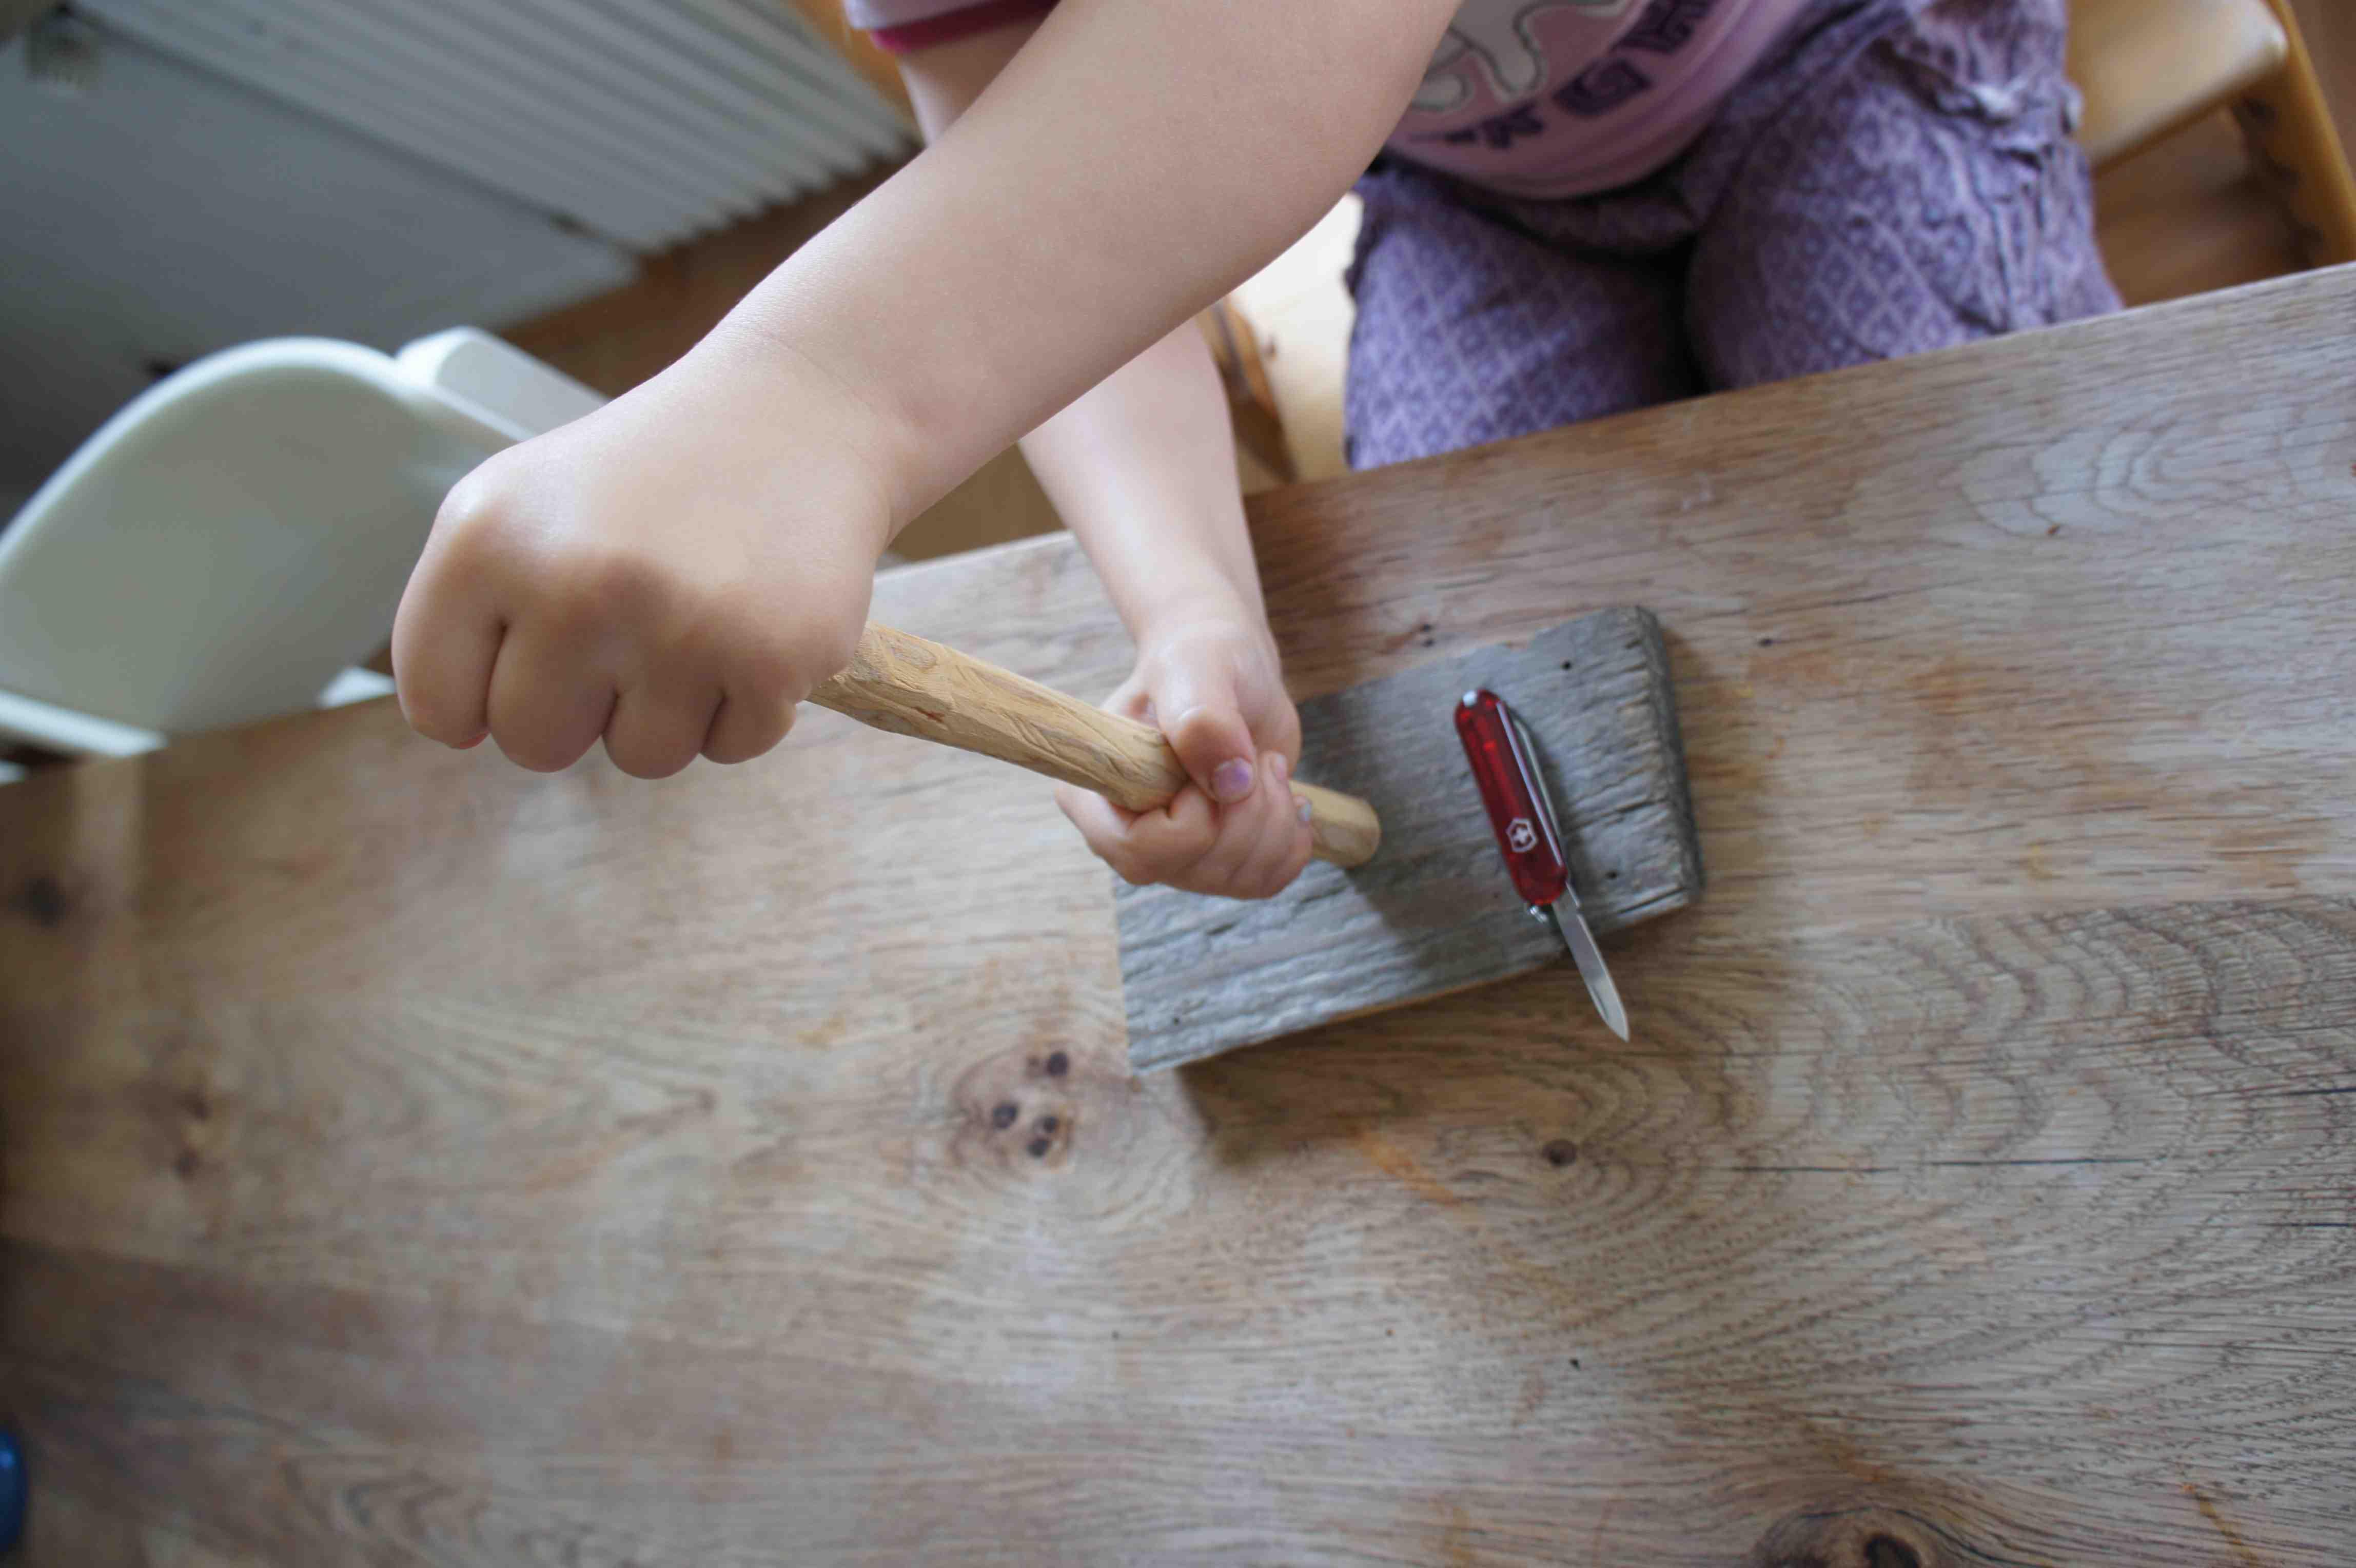 Steckt den Masten auf den Nagel.  Foto: (c) Kinderoutdoor.de